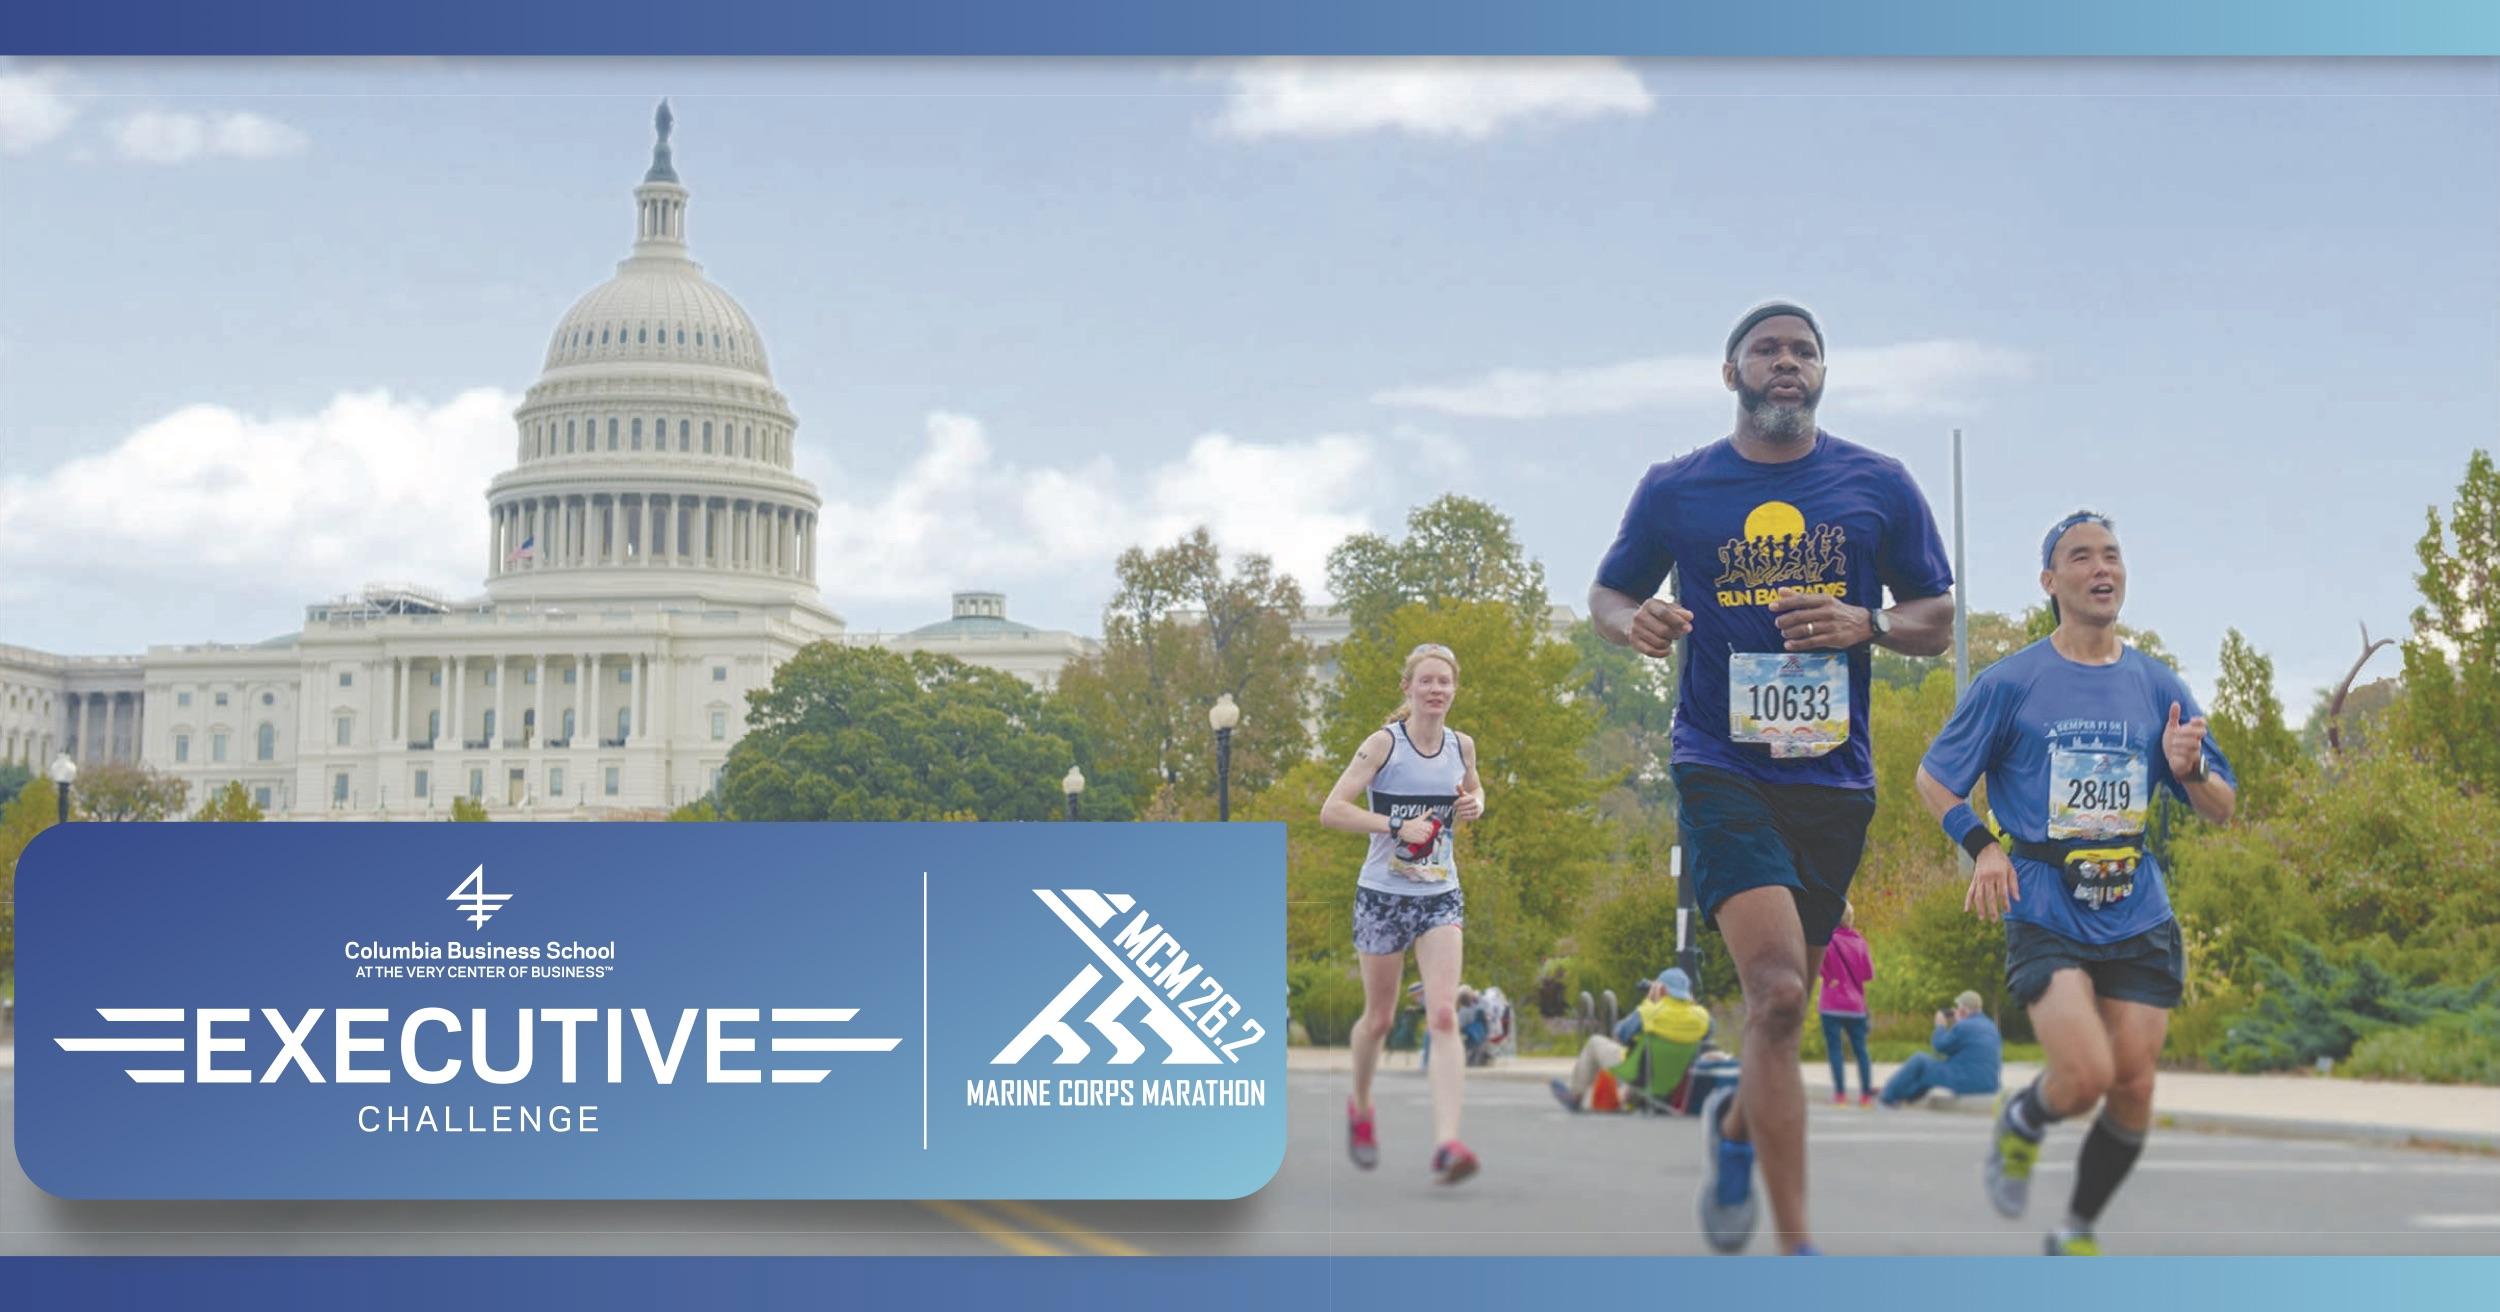 Like a boss executive challenge at mcm marine corps for Marine corps marathon shirt 2017